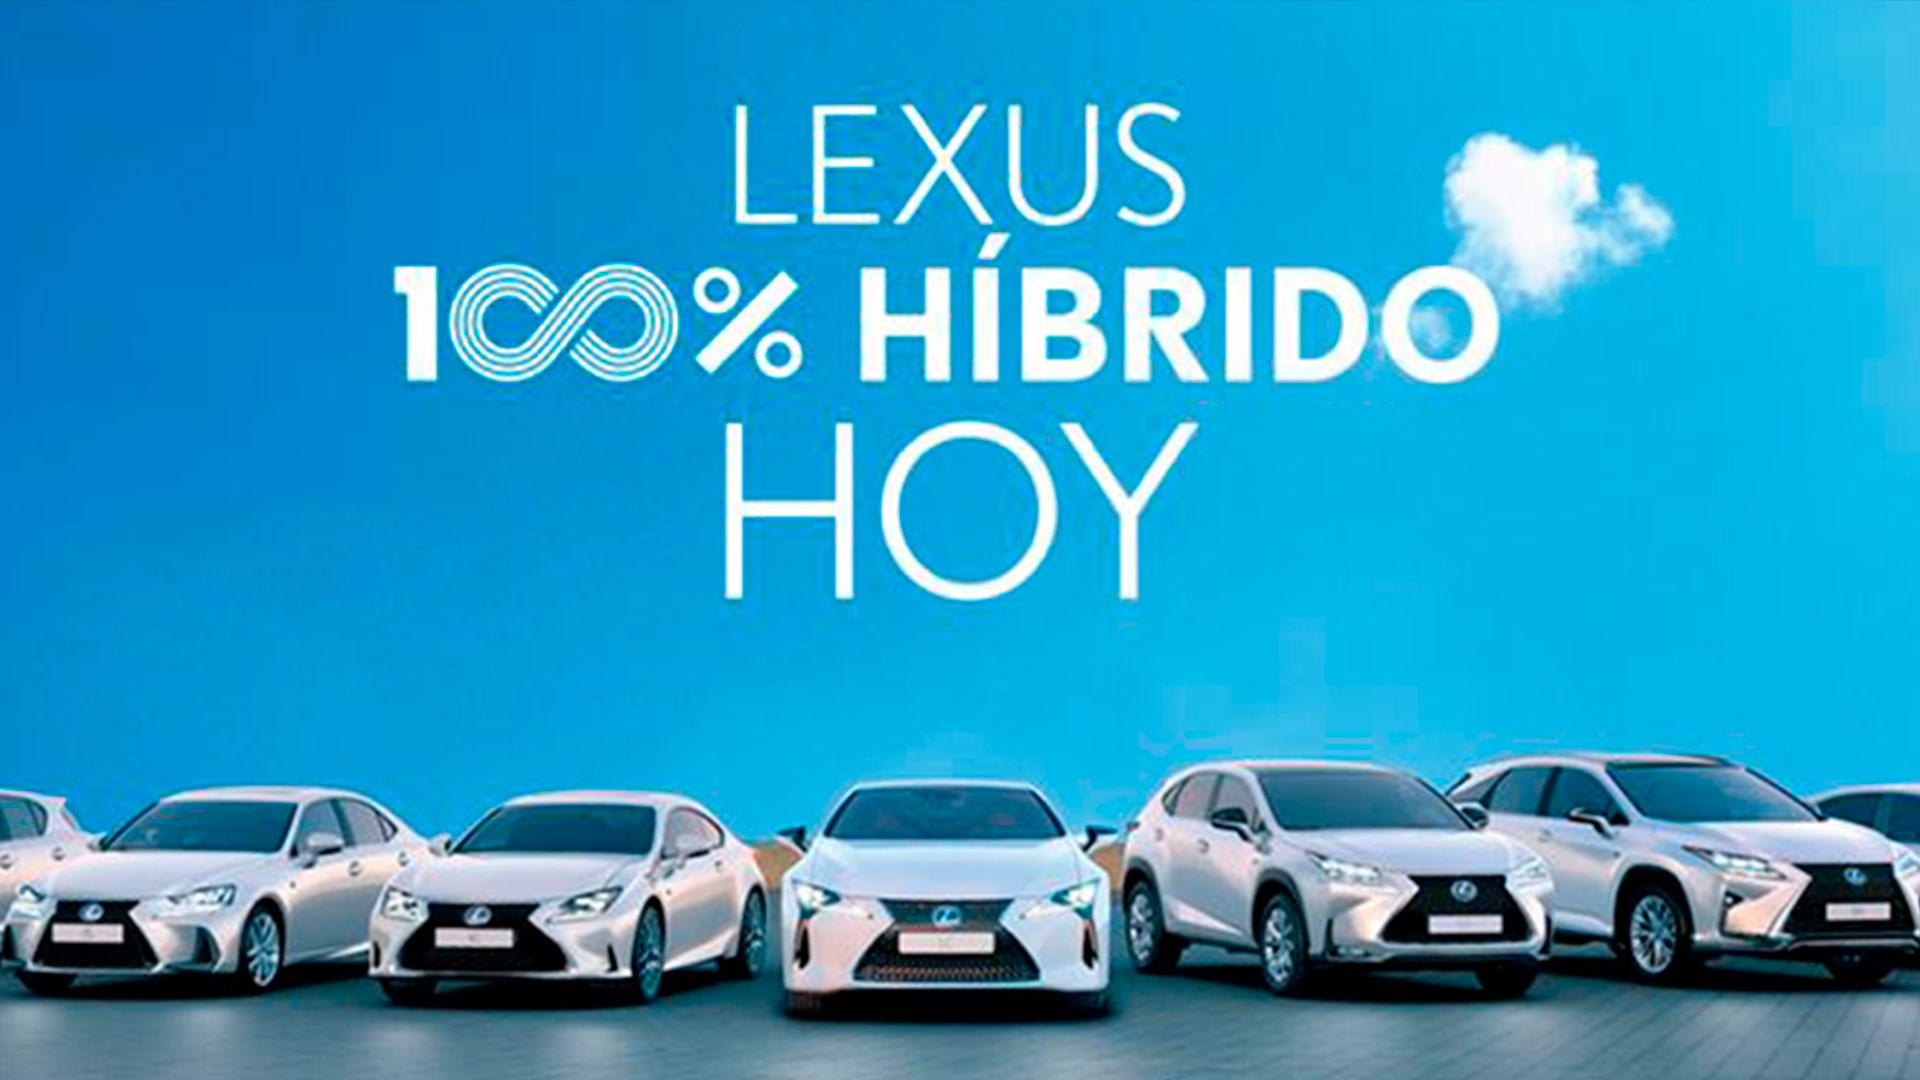 Lexus 100 híbrido hero asset